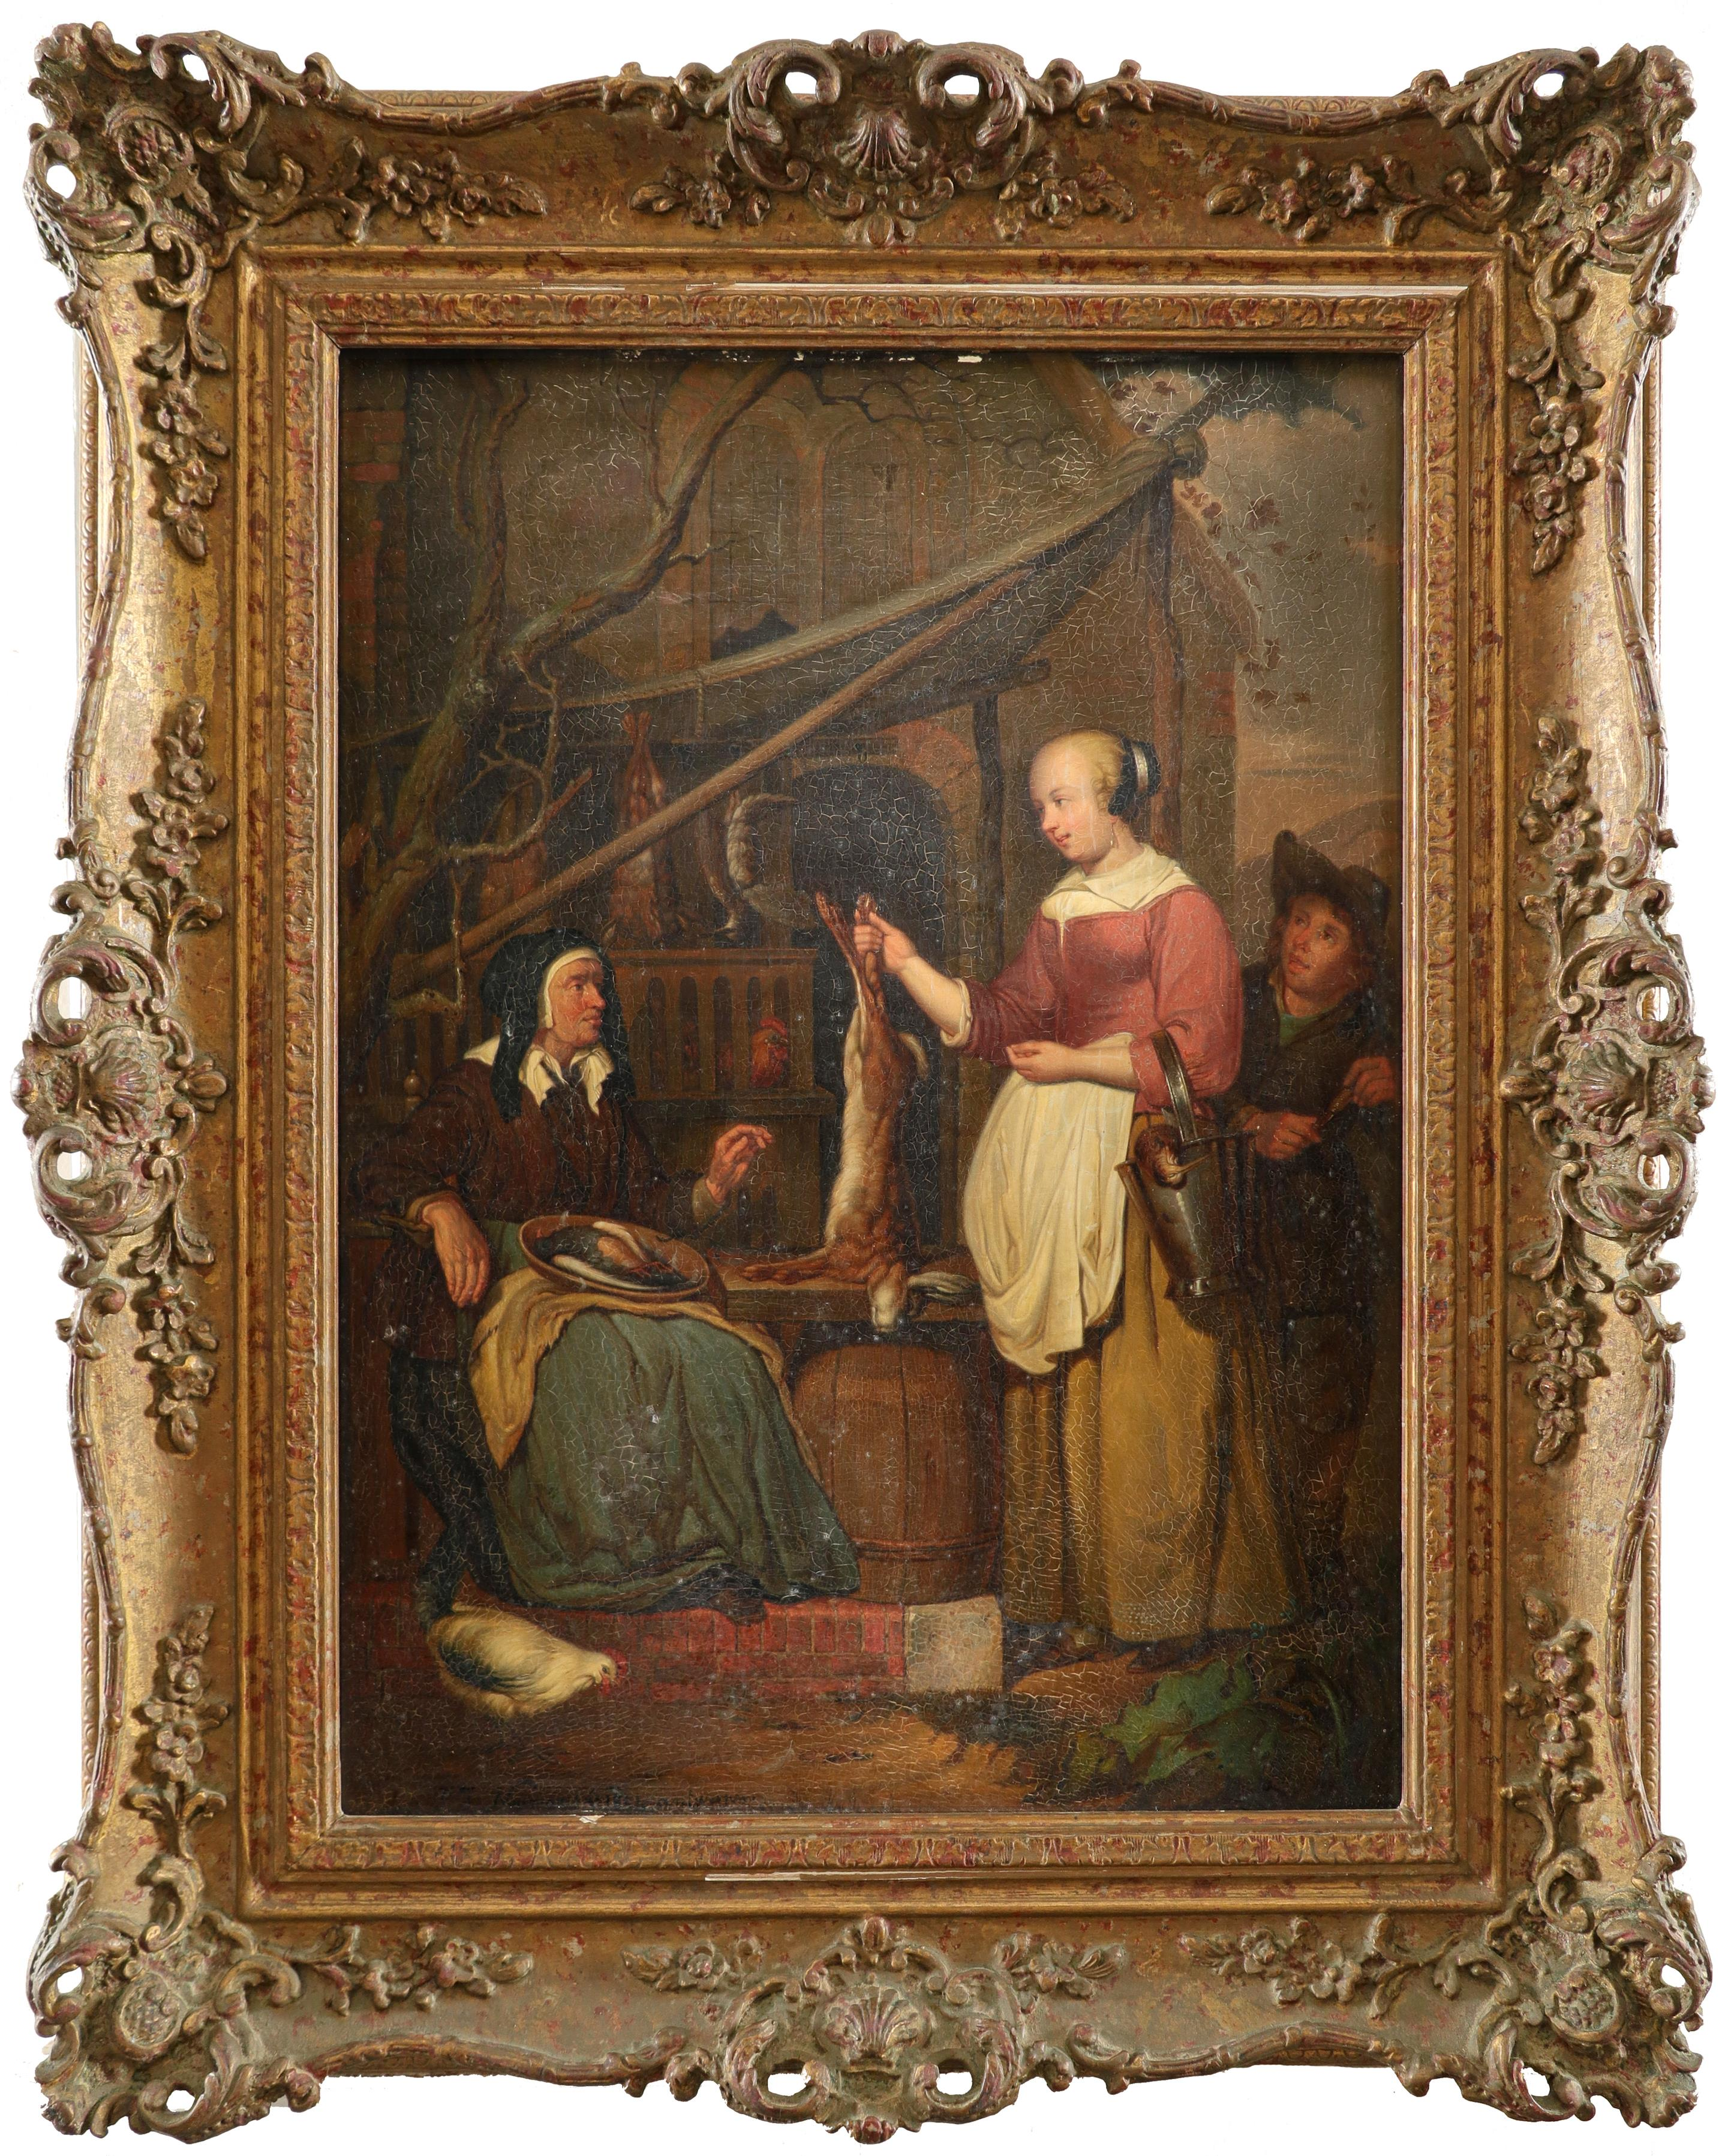 P. J. Neuman (Belgian 19th Century) after Gabriλl Metsu (Dutch 1629-1667) The old game dealer - Image 2 of 3